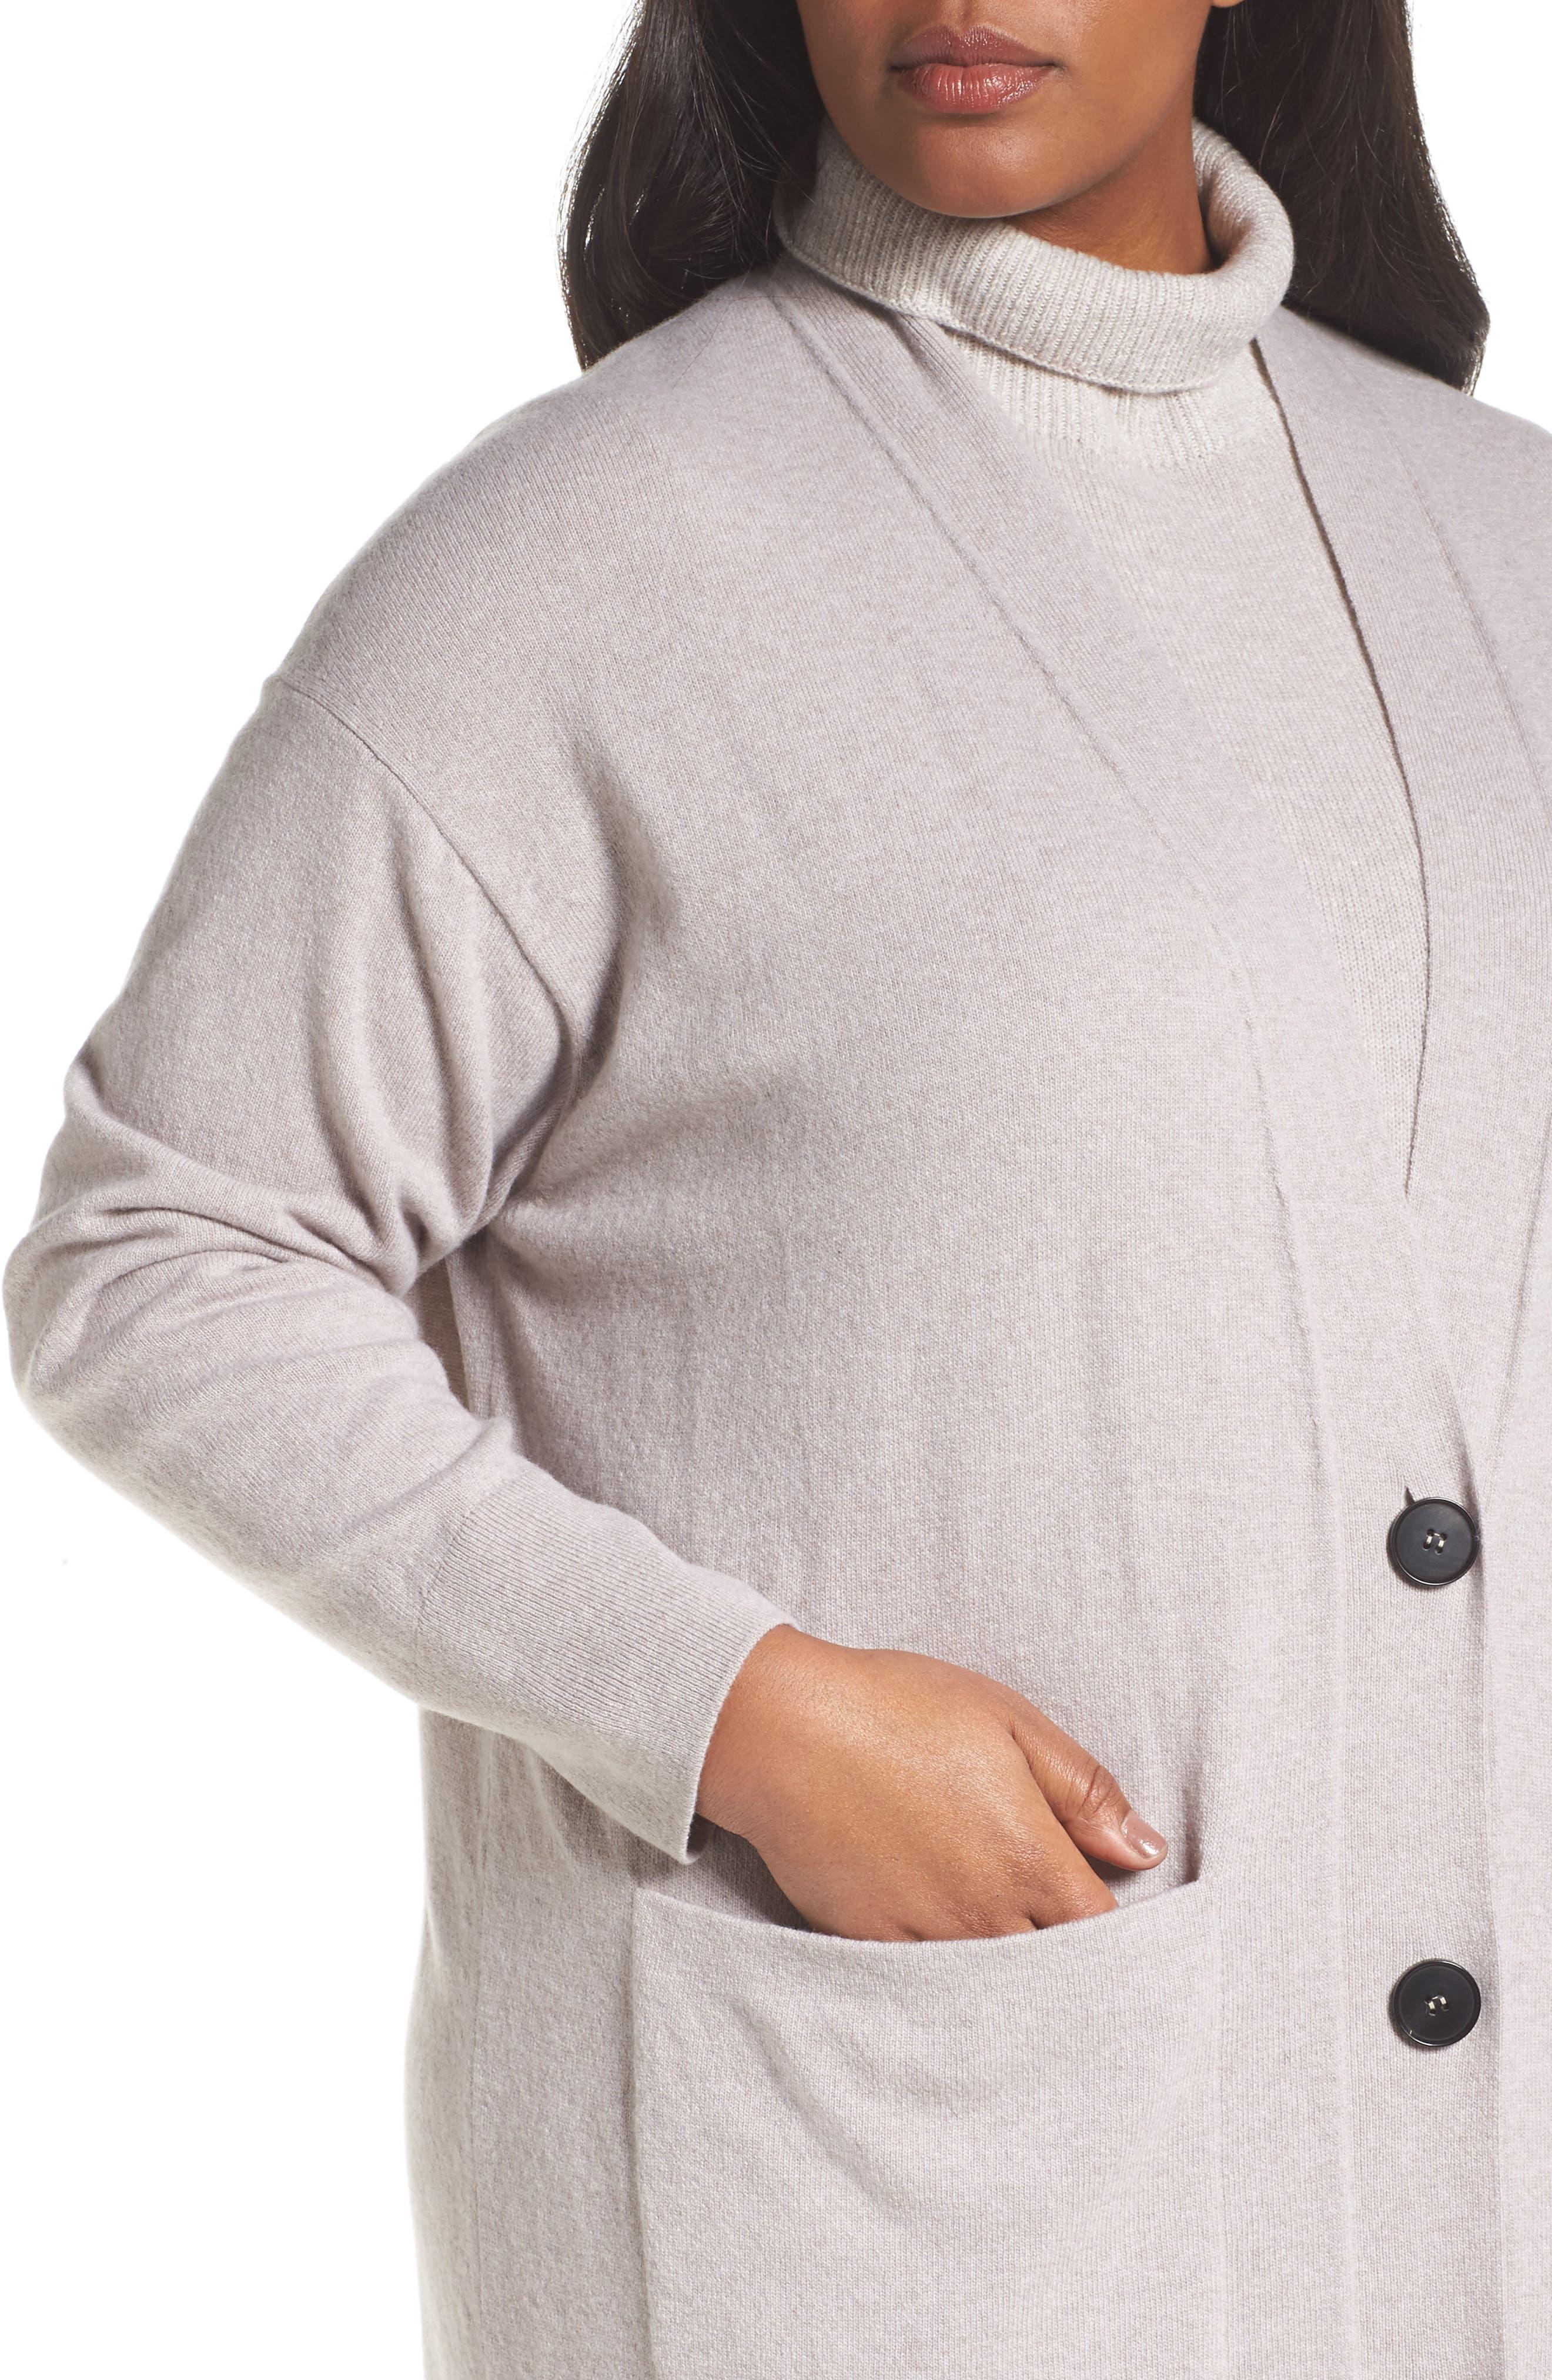 Long Merino Wool & Cashmere Cardigan,                             Alternate thumbnail 4, color,                             264